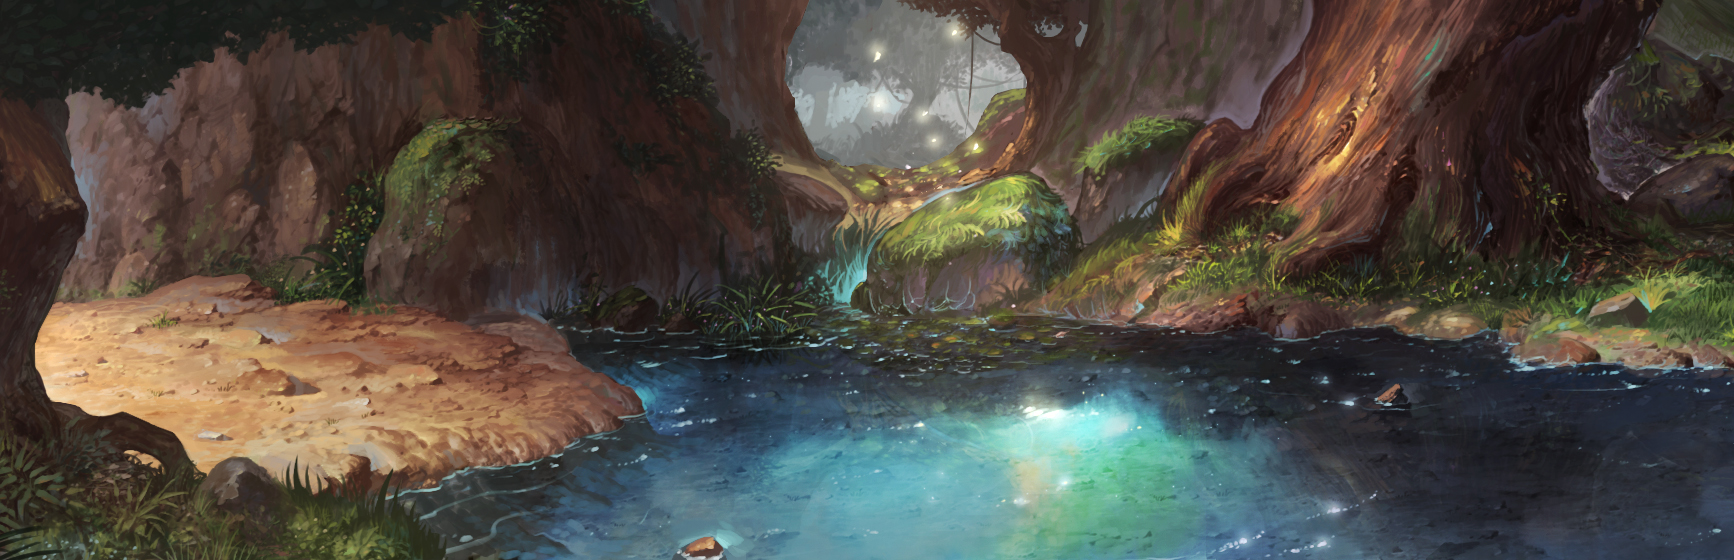 Inside the forest by puyoakira